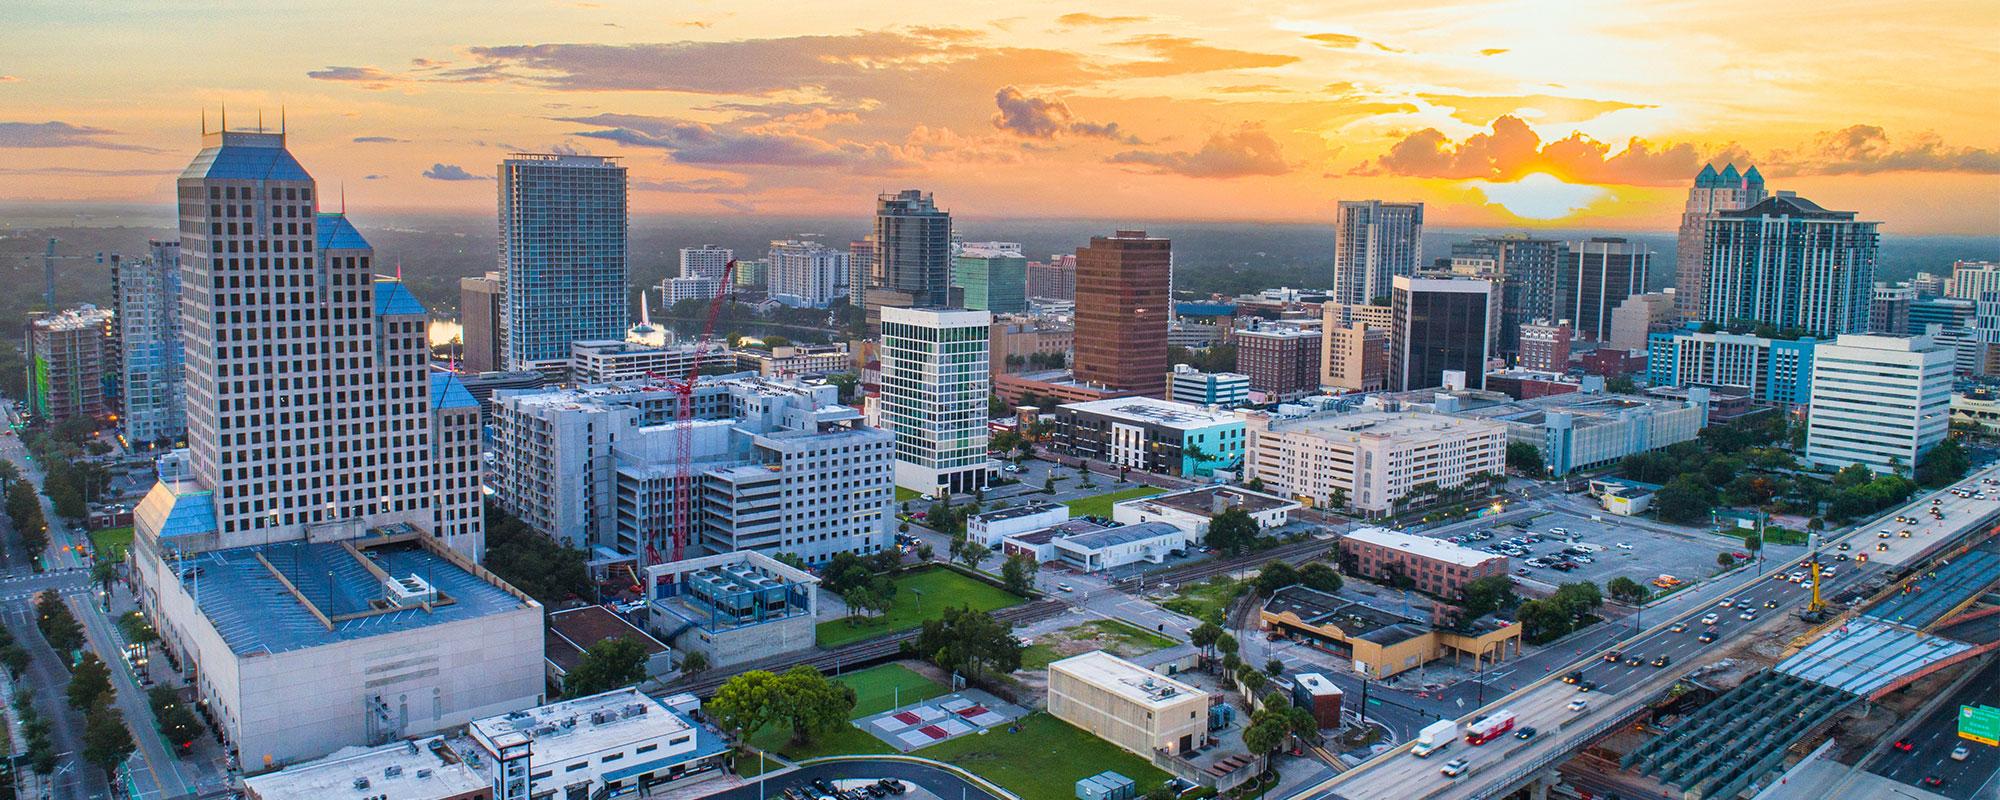 North Orlando 537785609.jpg